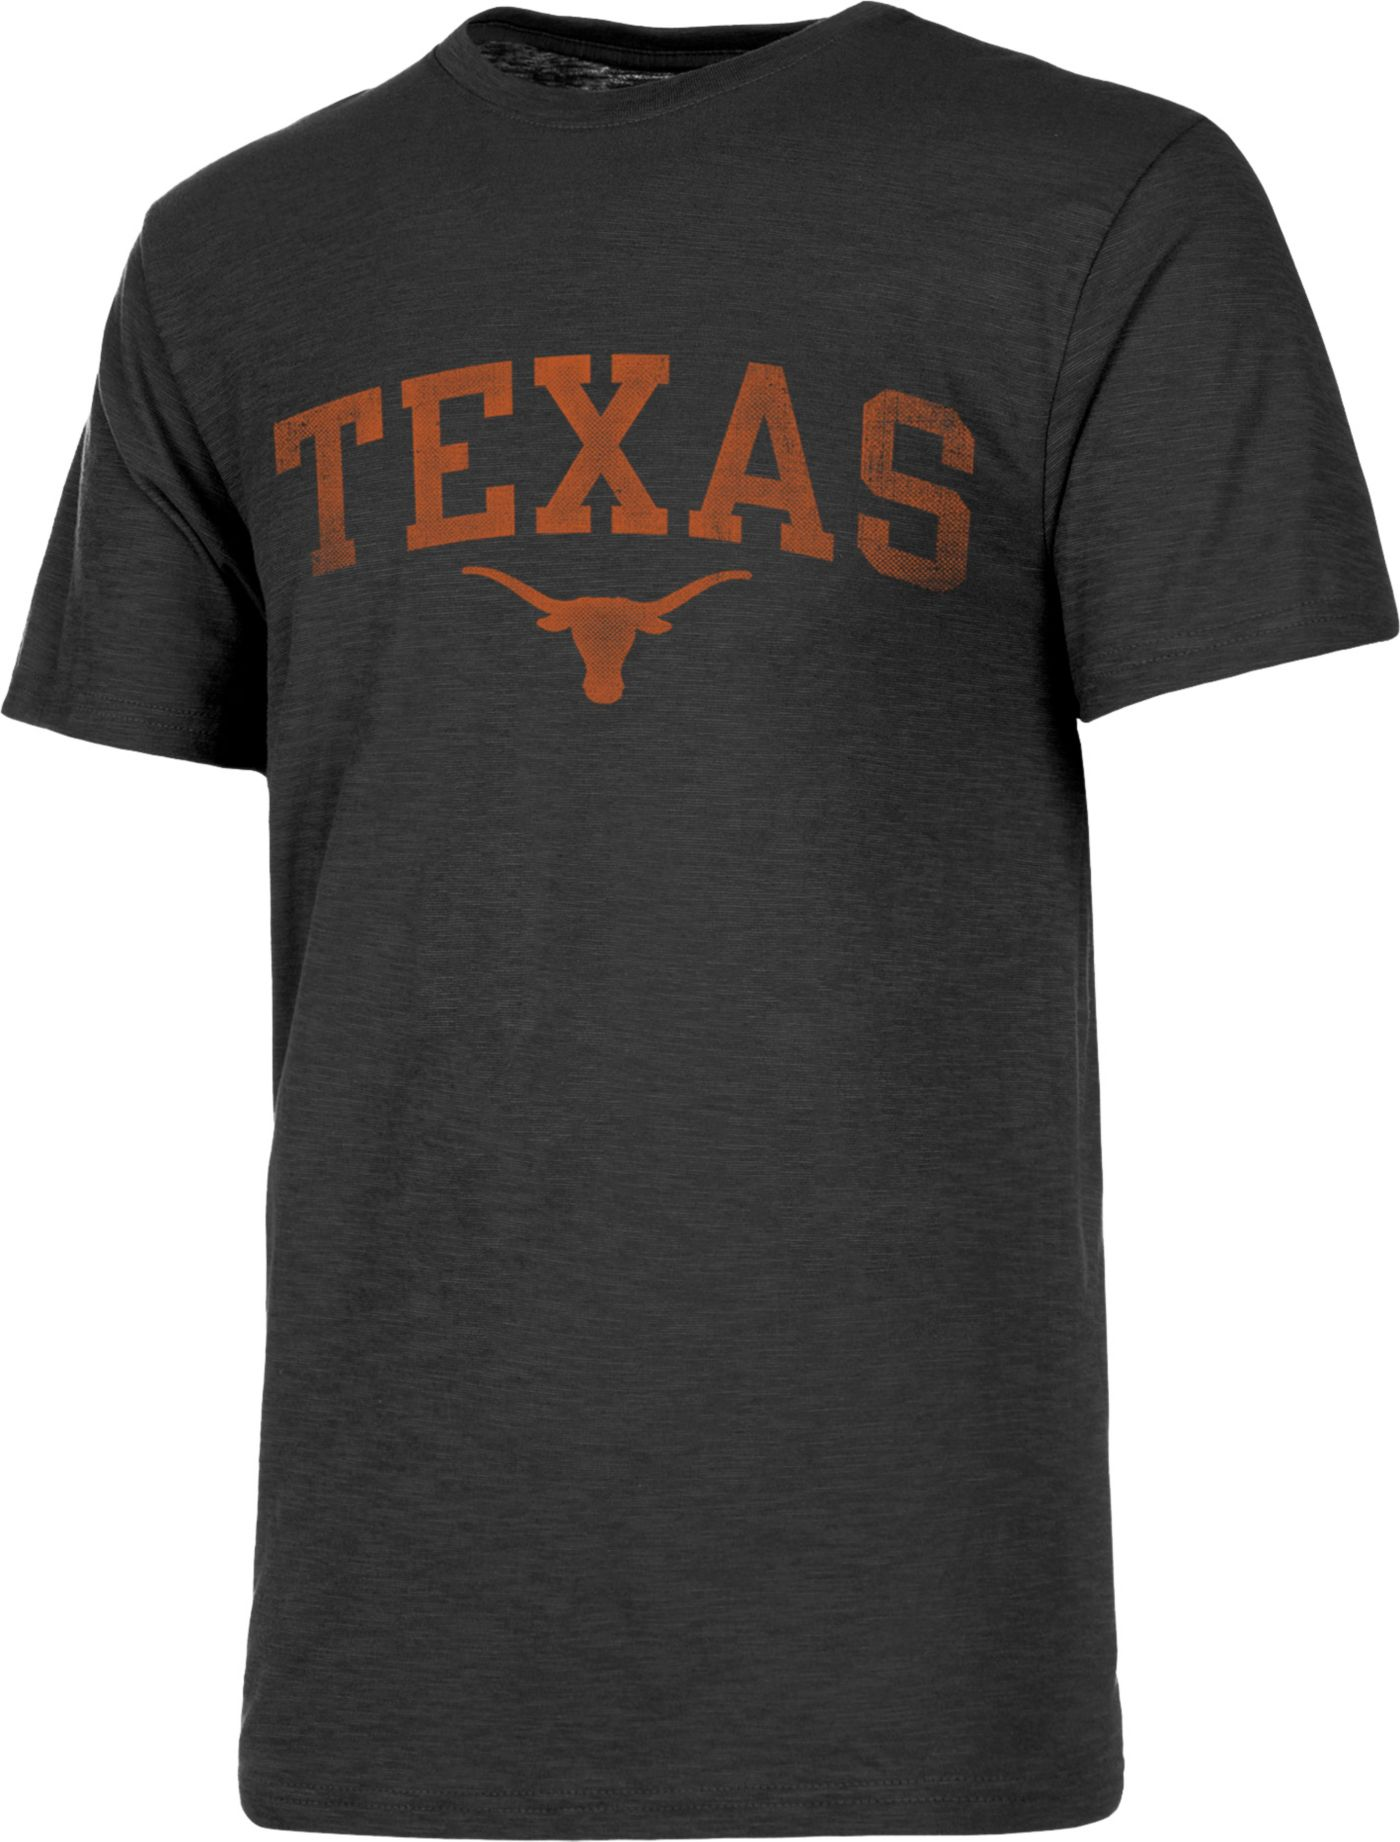 University of Texas Authentic Apparel Men's Texas Longhorns Grey Slub T-Shirt